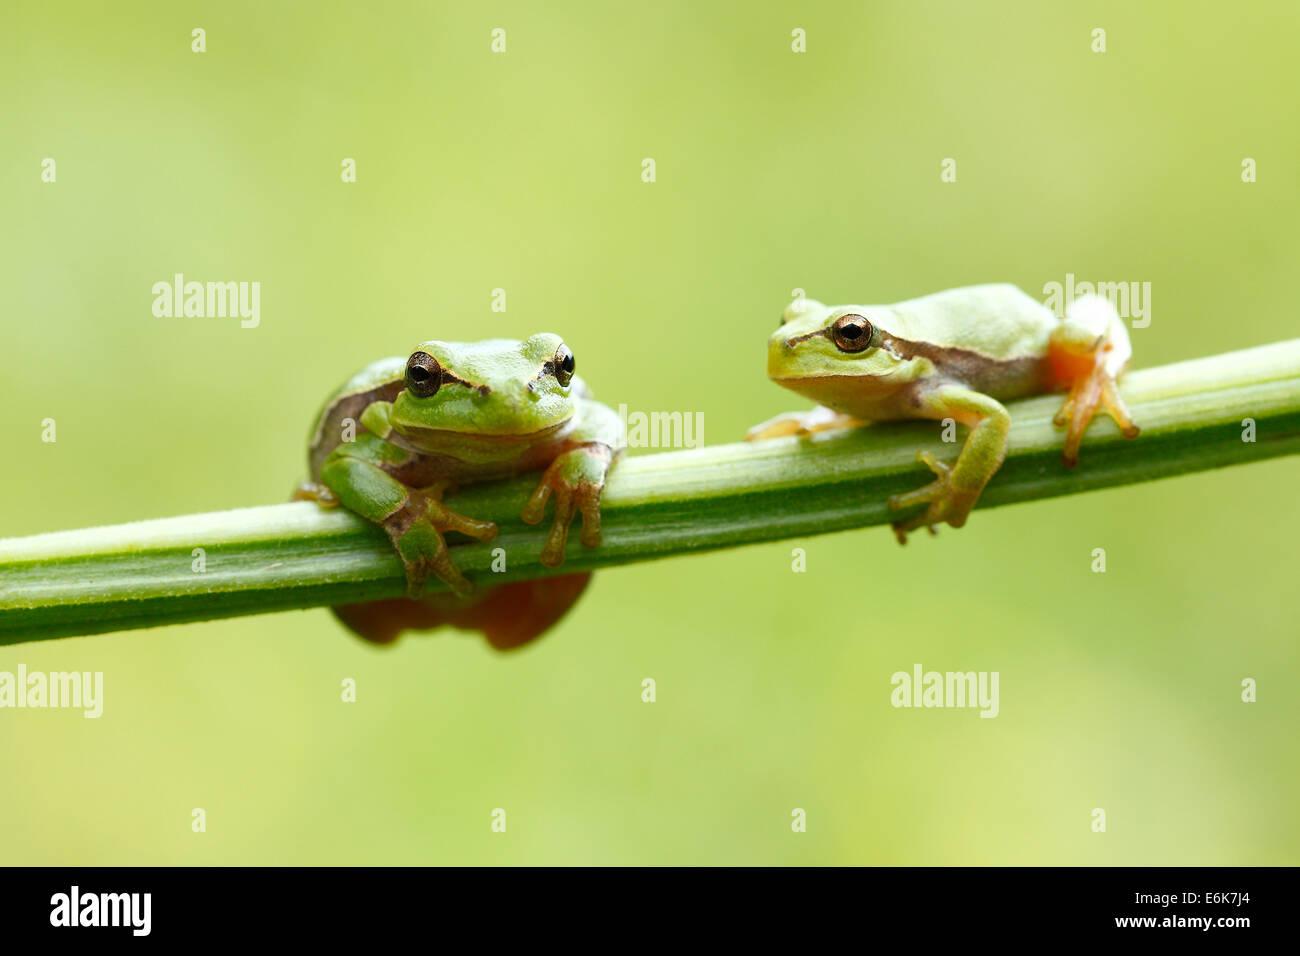 Two European Treefrogs (Hyla arborea) perched on a blade of grass, Tyrol, Austria - Stock Image